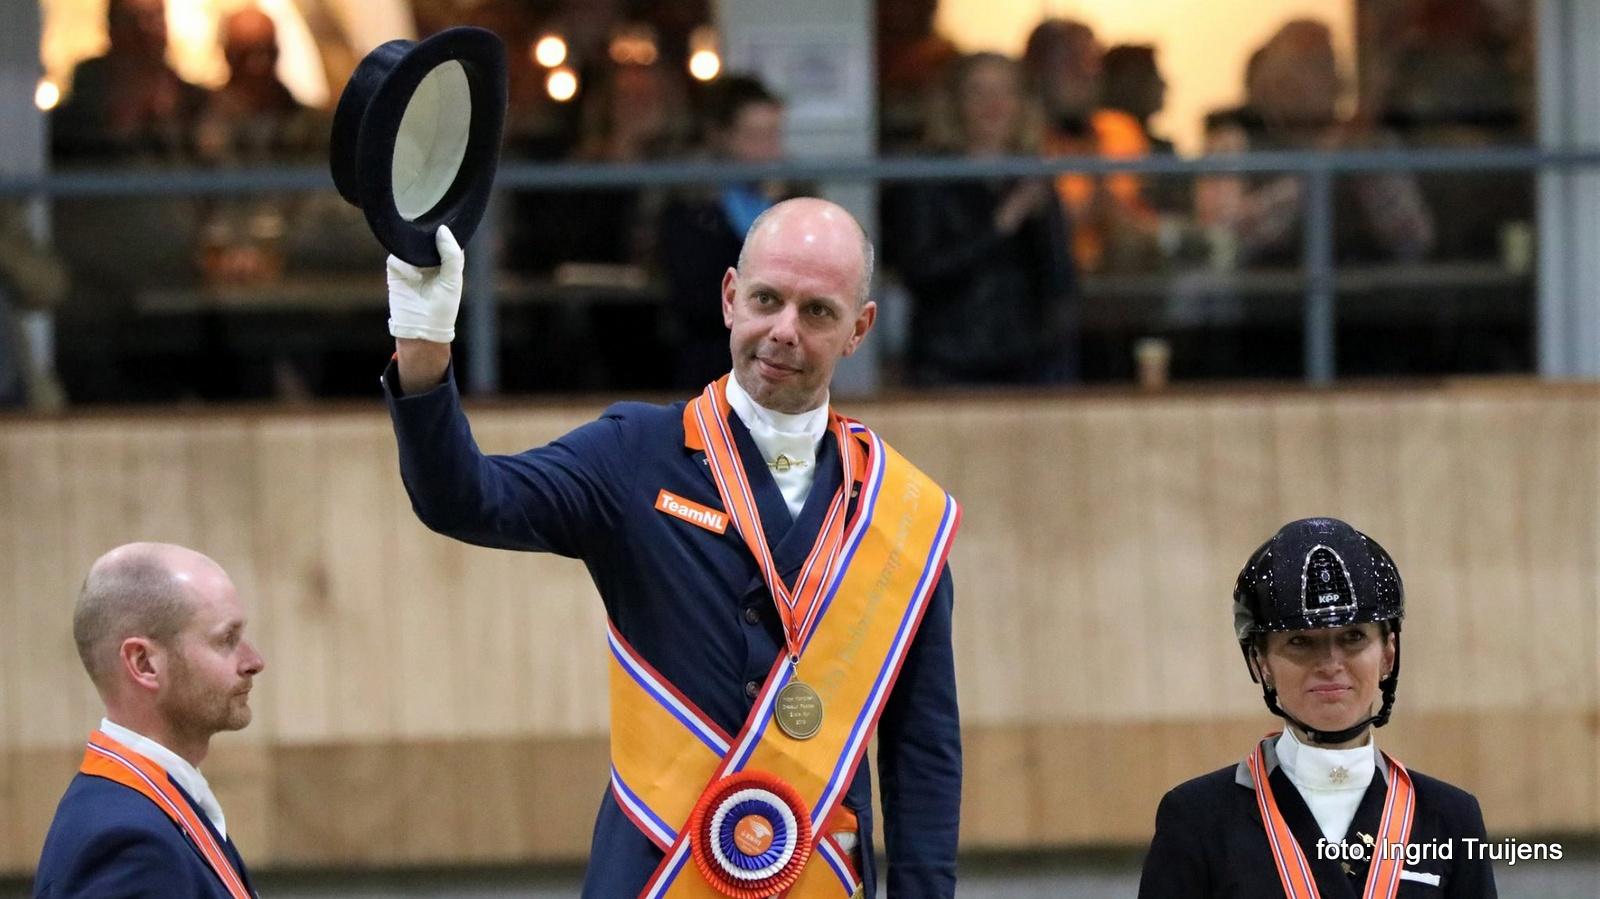 Hans Peter Minderhoud grijpt KNHS-titel met Zanardi